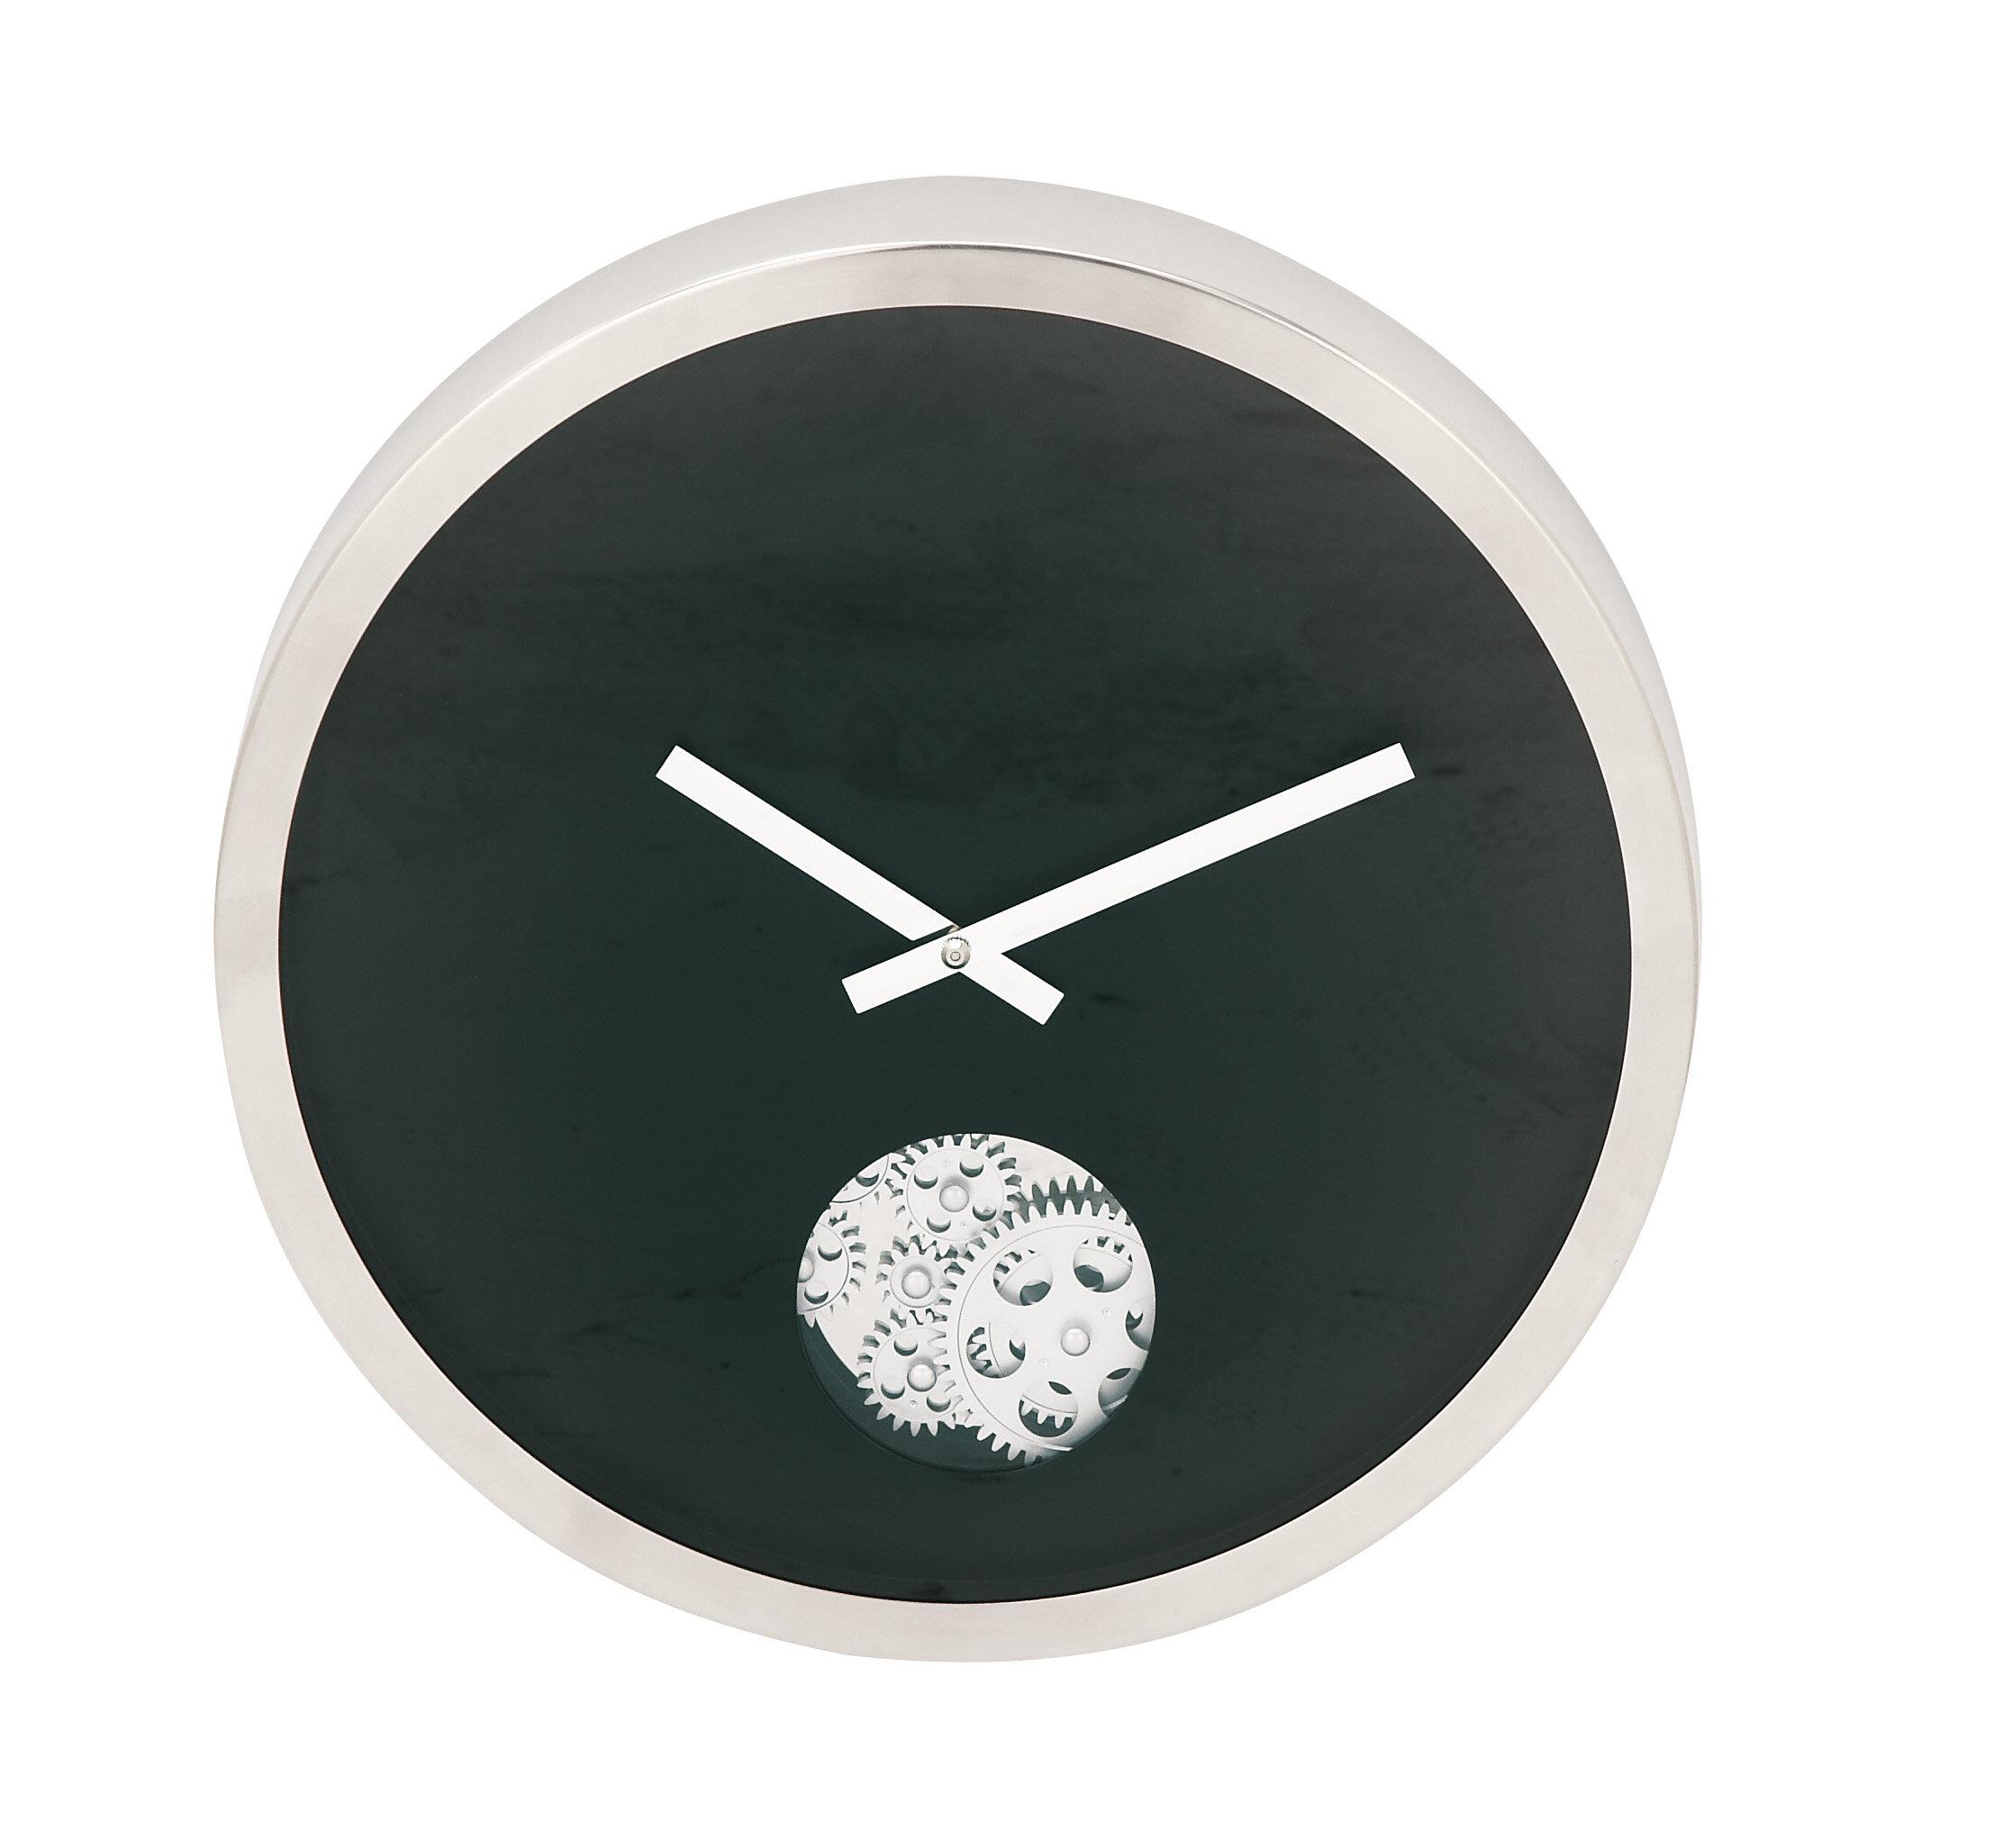 Cole Grey Stainless Steel Gear 17 Wall Clock Wayfair